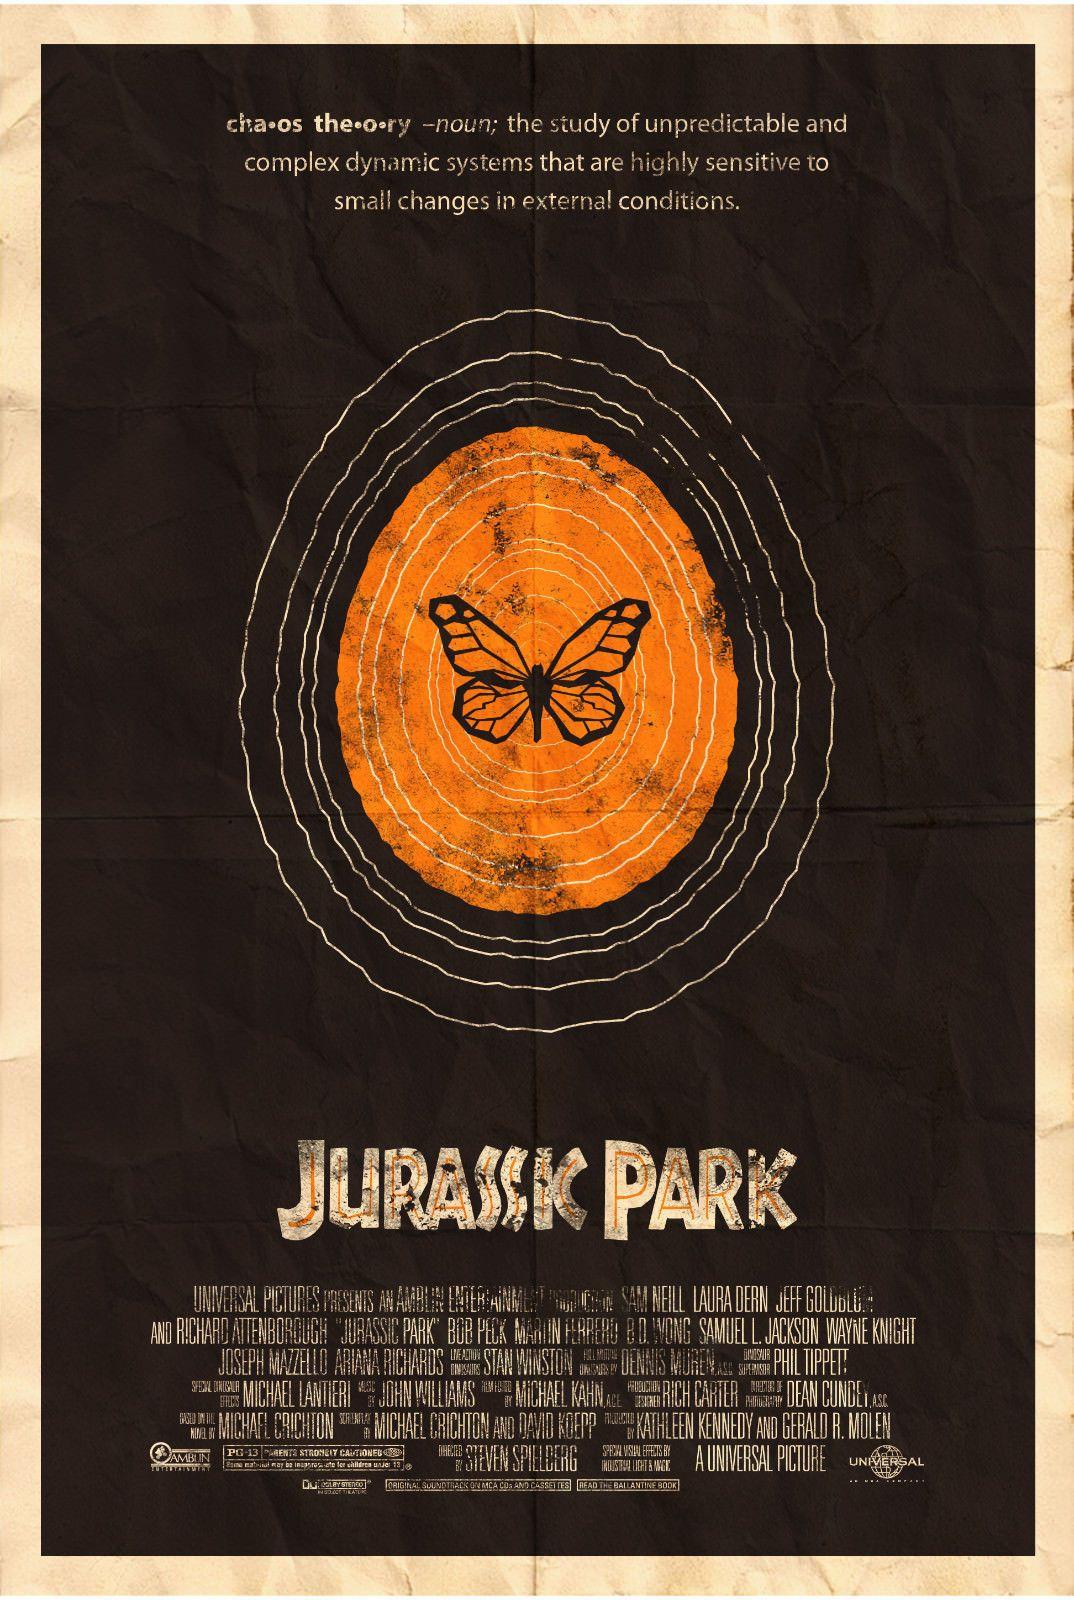 Jurassic park wall art movie art silk print poster 24x36inch60x90cm 018